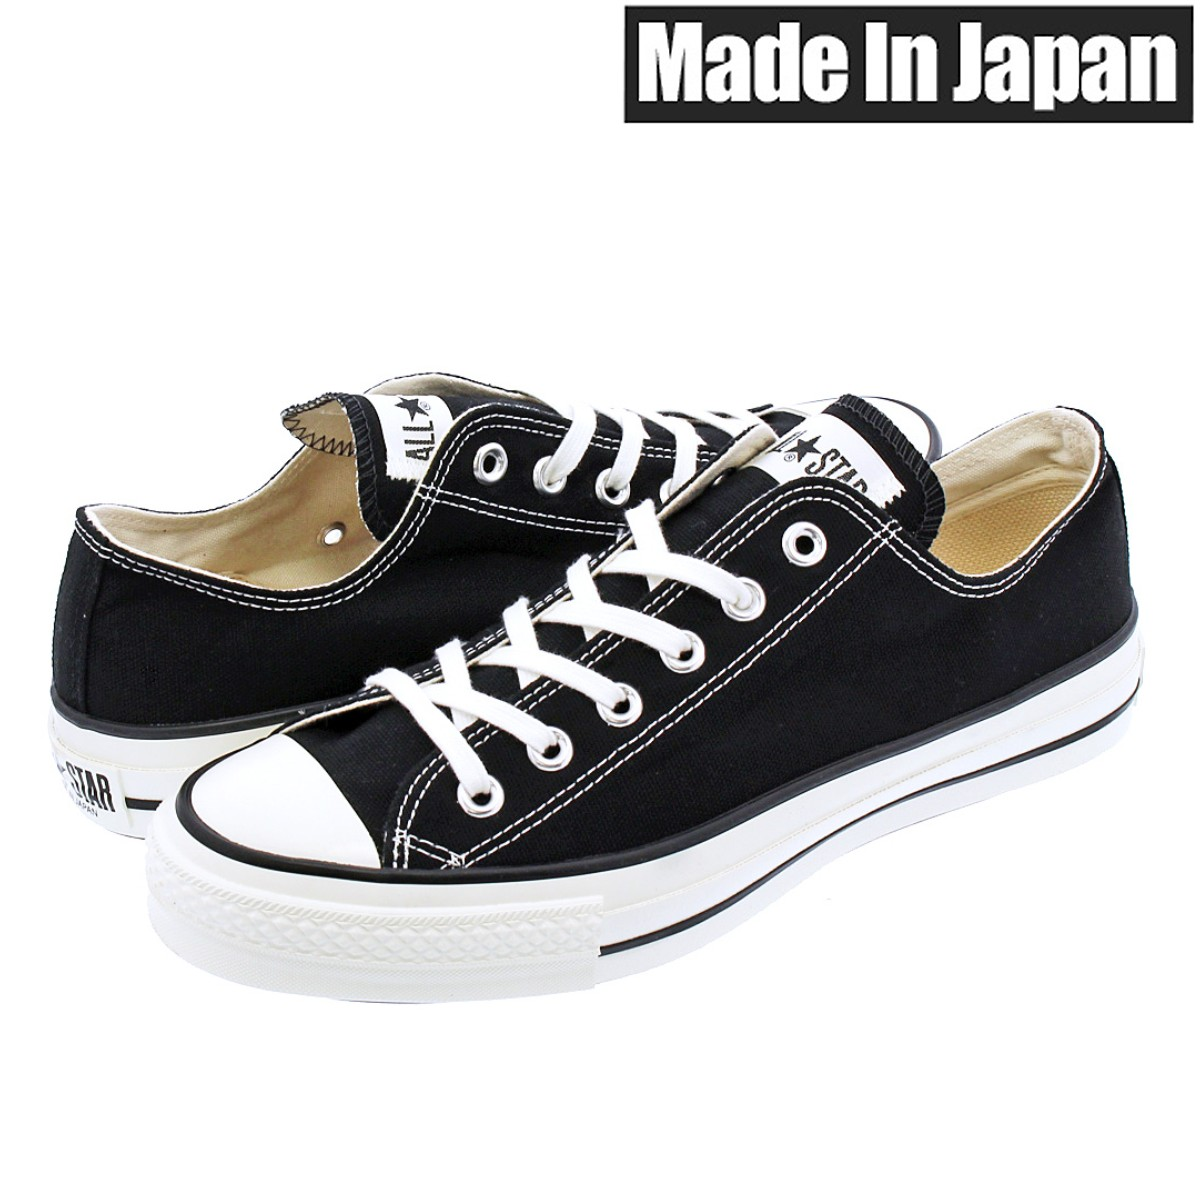 CONVERSE CANVAS ALL STAR J OX 【MADE IN JAPAN】【日本製】 コンバース オールスター J OX BLACK